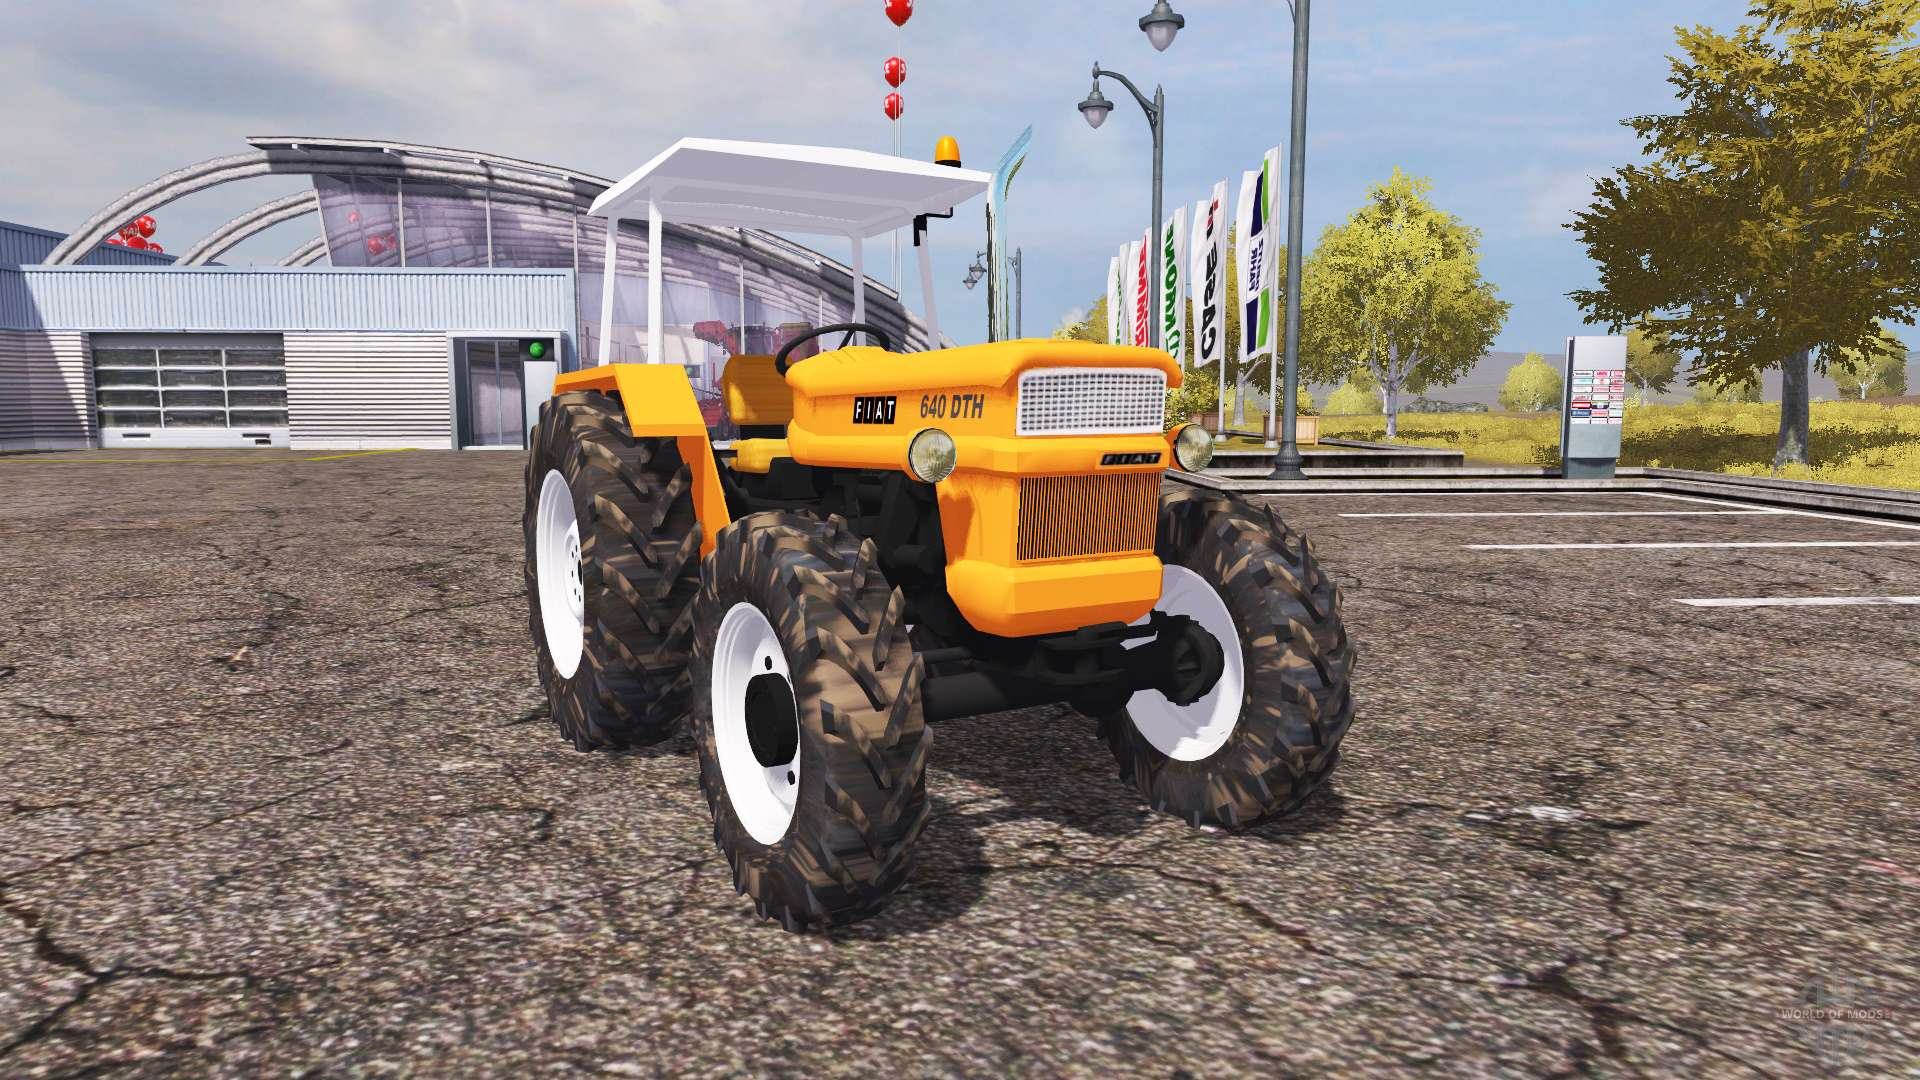 Atemberaubend Fiat 640 DTH v2.2 for Farming Simulator 2013 &TM_18